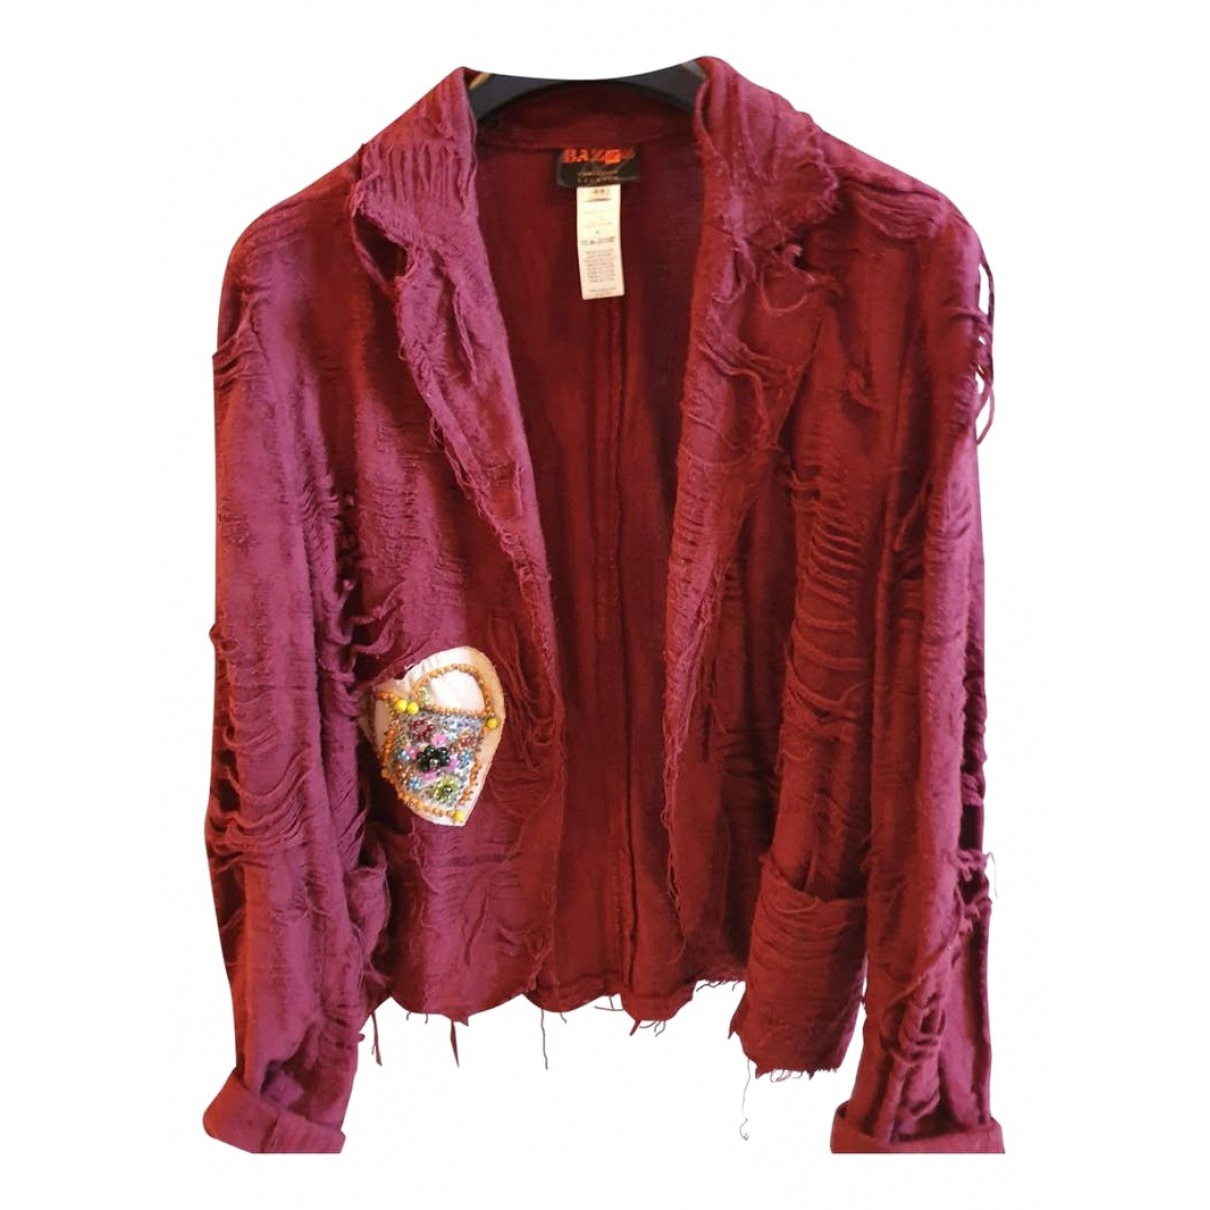 Christian Lacroix \N Burgundy Cotton jacket for Women 44 FR